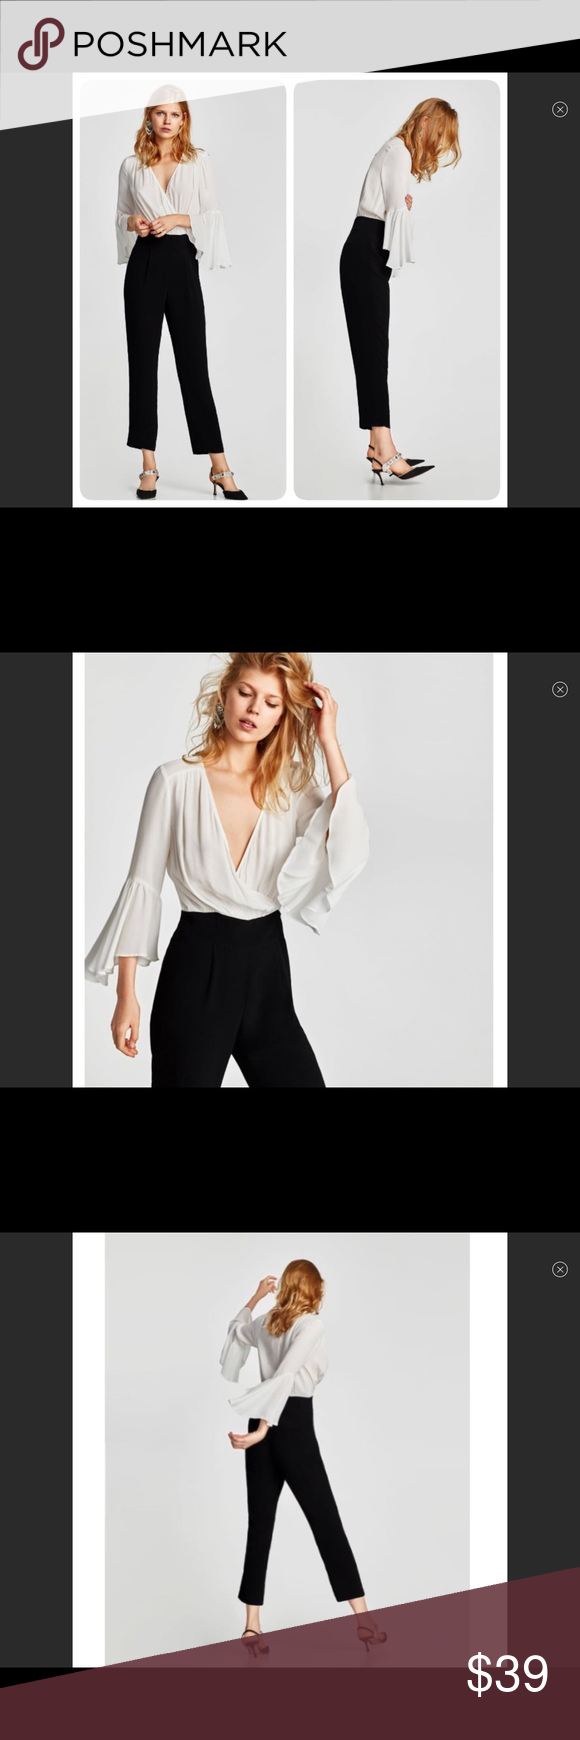 89c2477af4e Black And White Jumpsuit Zara - Data Dynamic AG